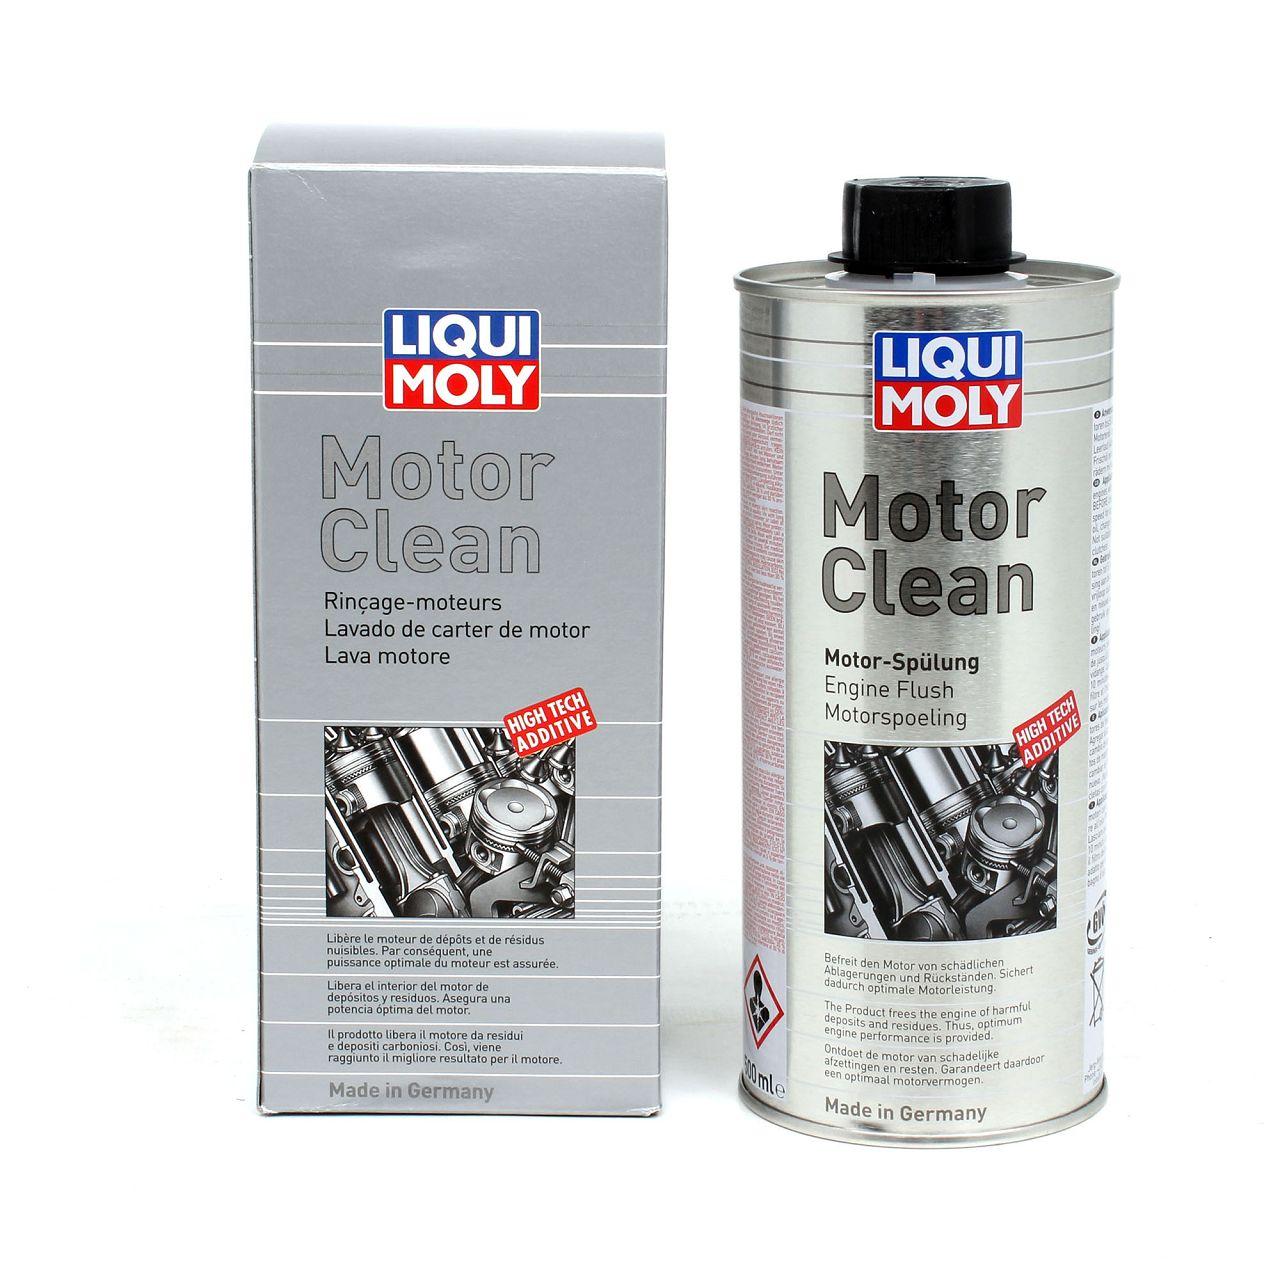 LIQUI MOLY Motorclean- Motoren Spülung Motorreinigung 500 ml 1019